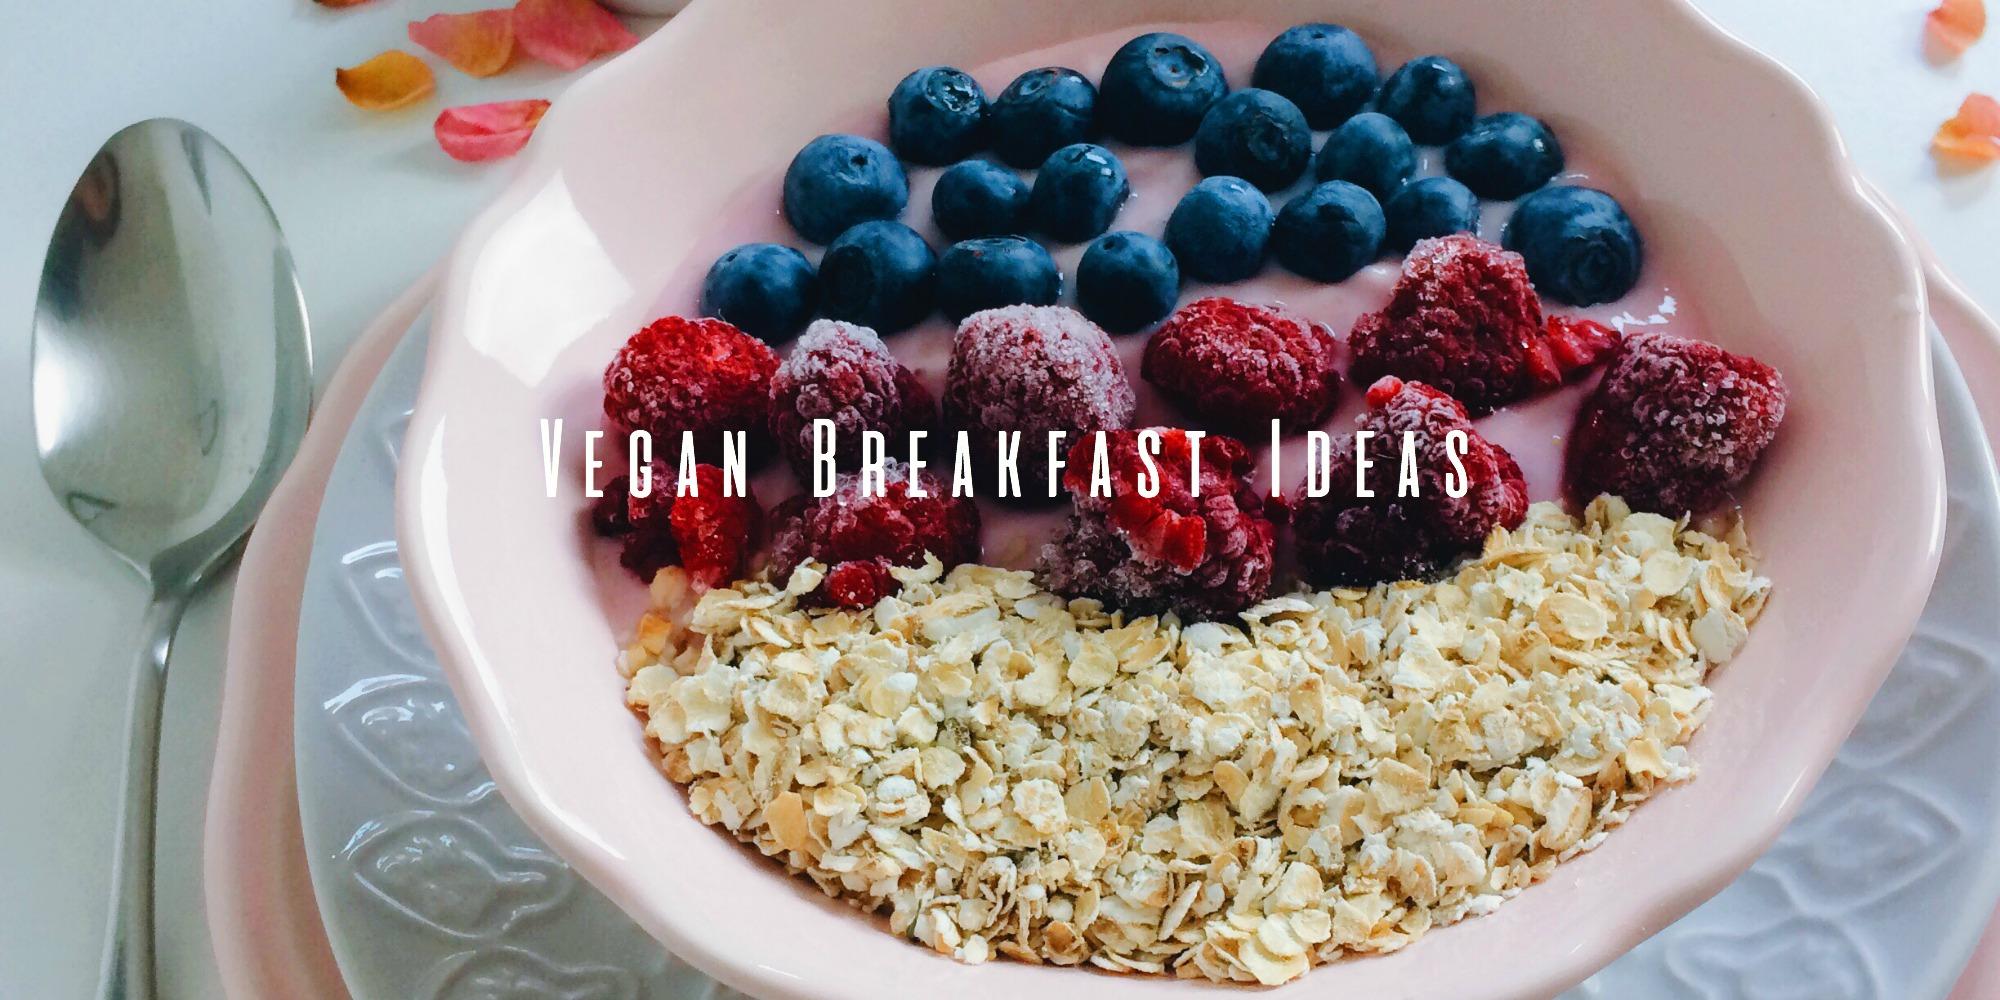 Vegan Breakfast Ideas banner